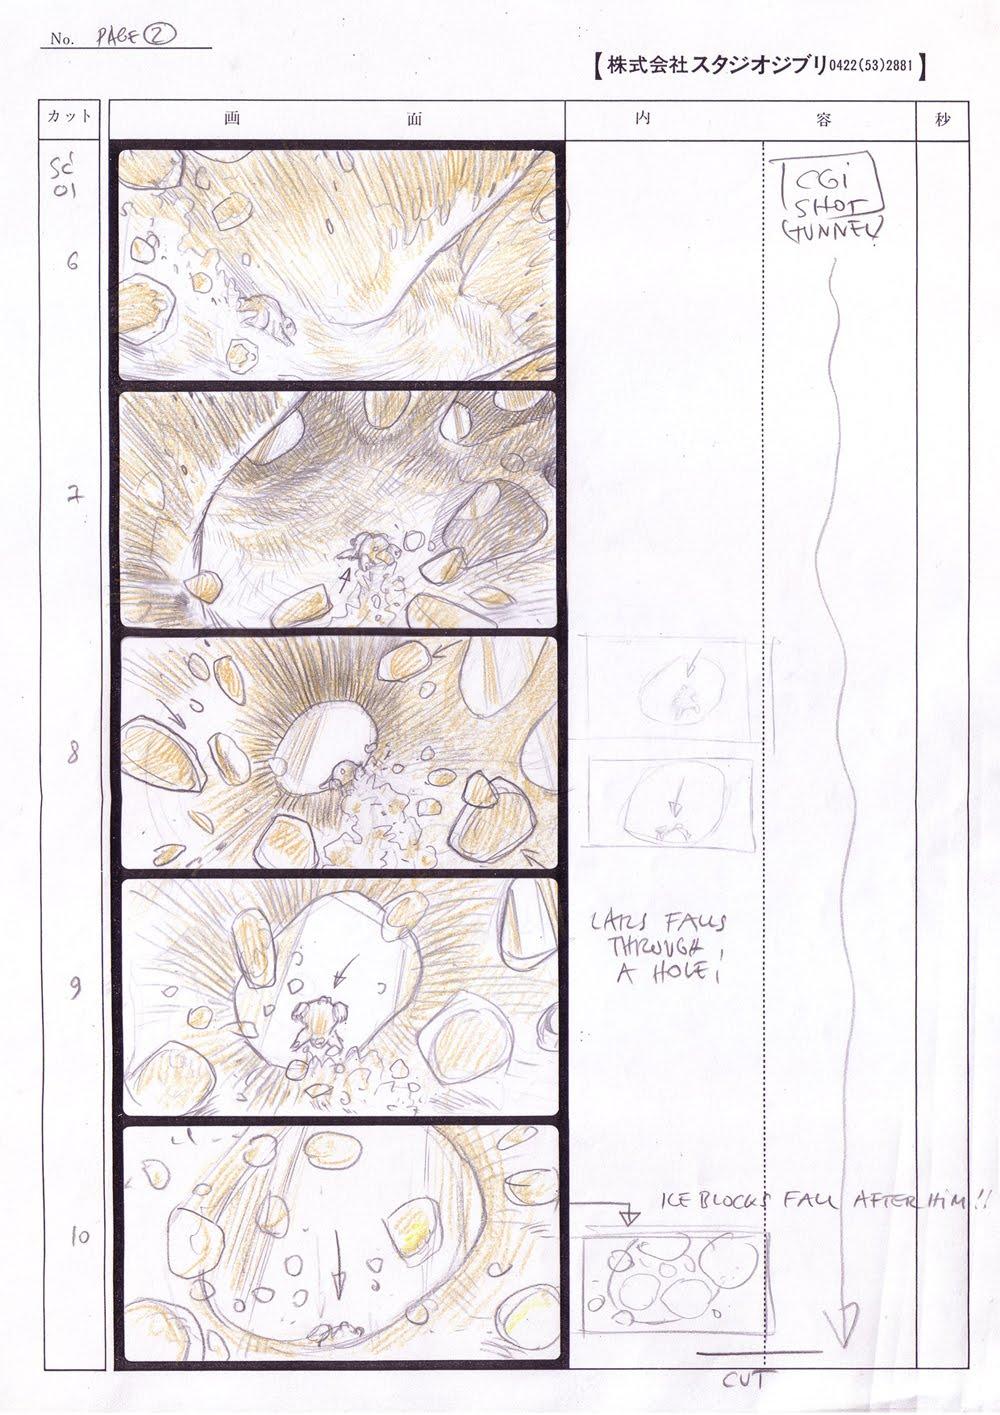 storyboard template online